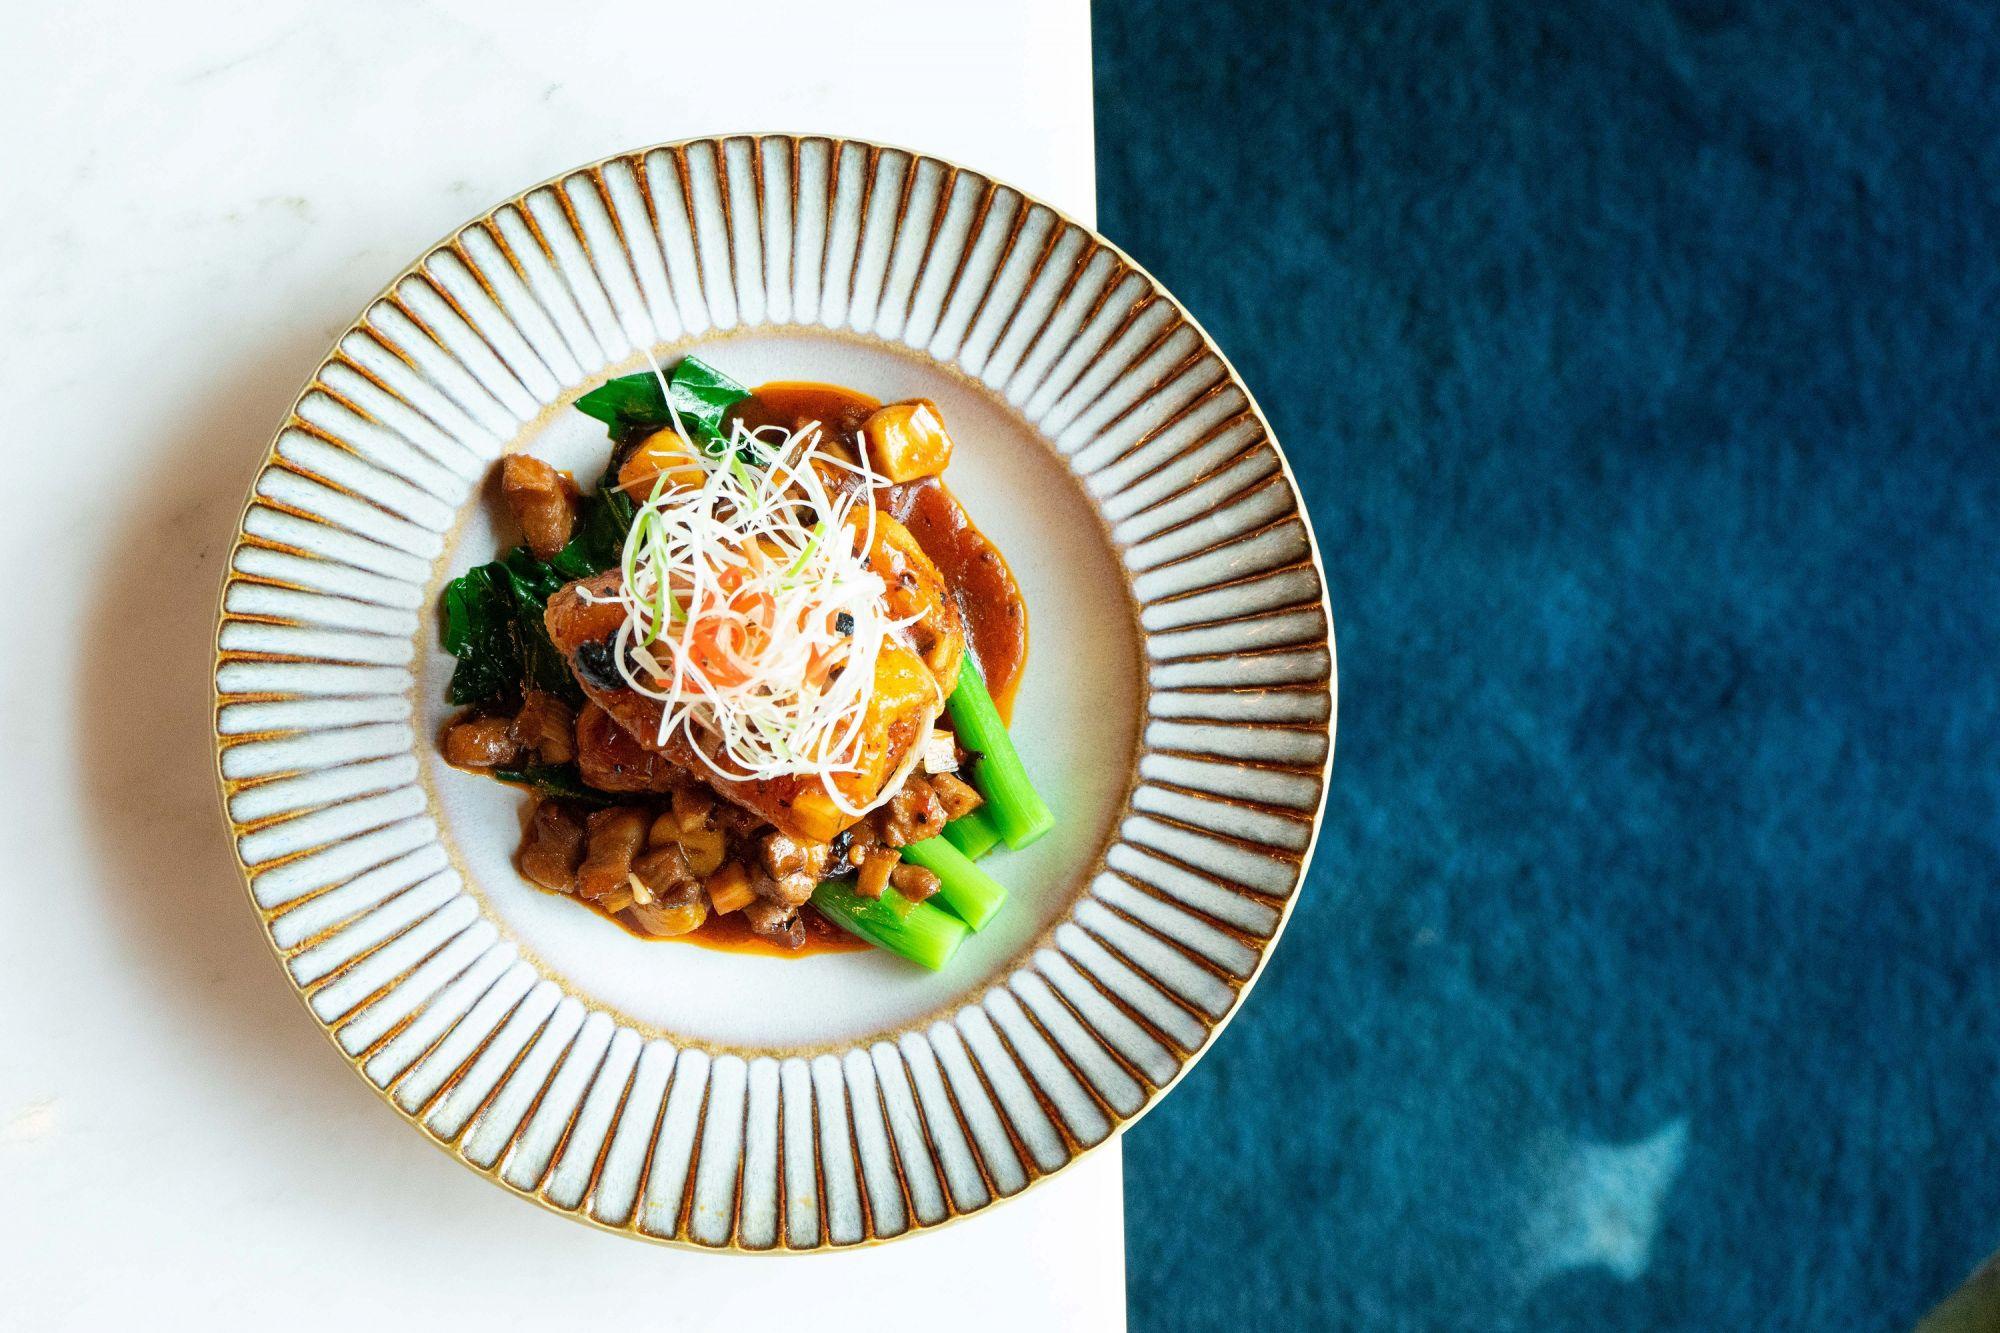 Nanbei's New Menu Celebrates Authentic Sichuan Cuisine